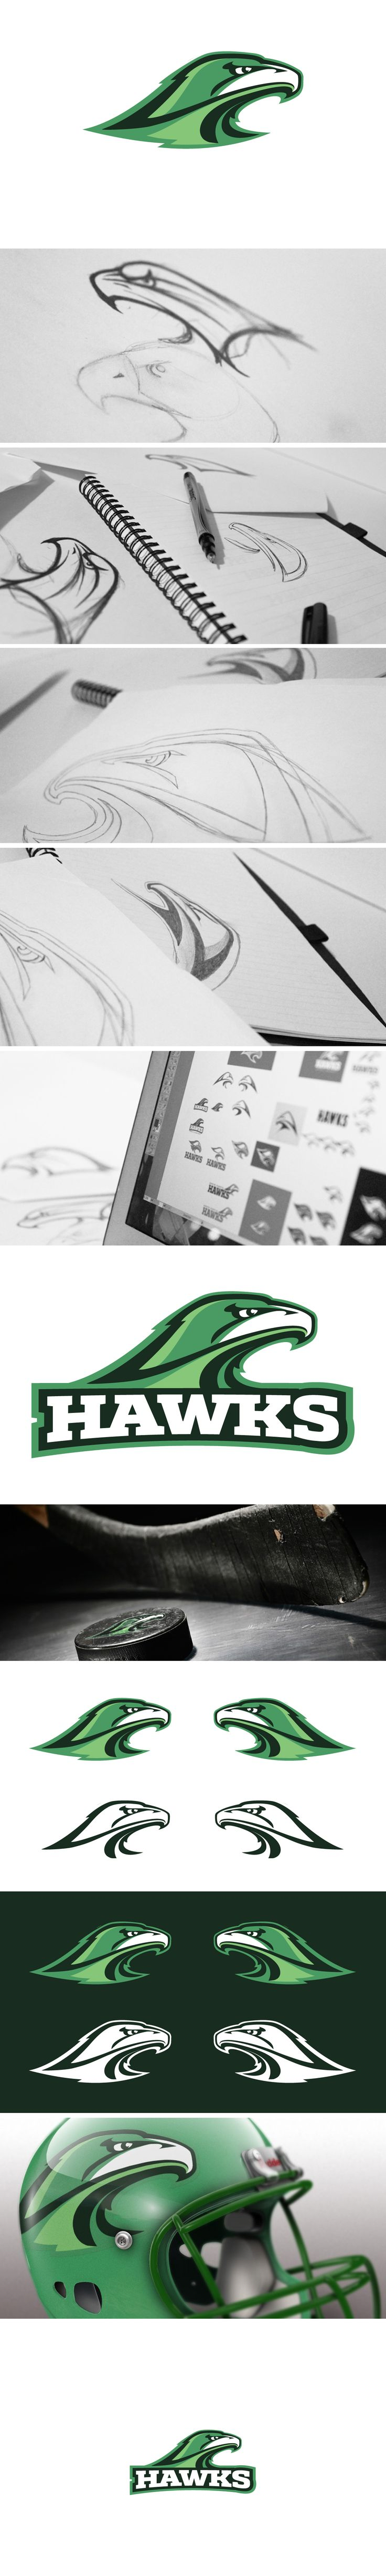 Hawks Logo Concept on Behance